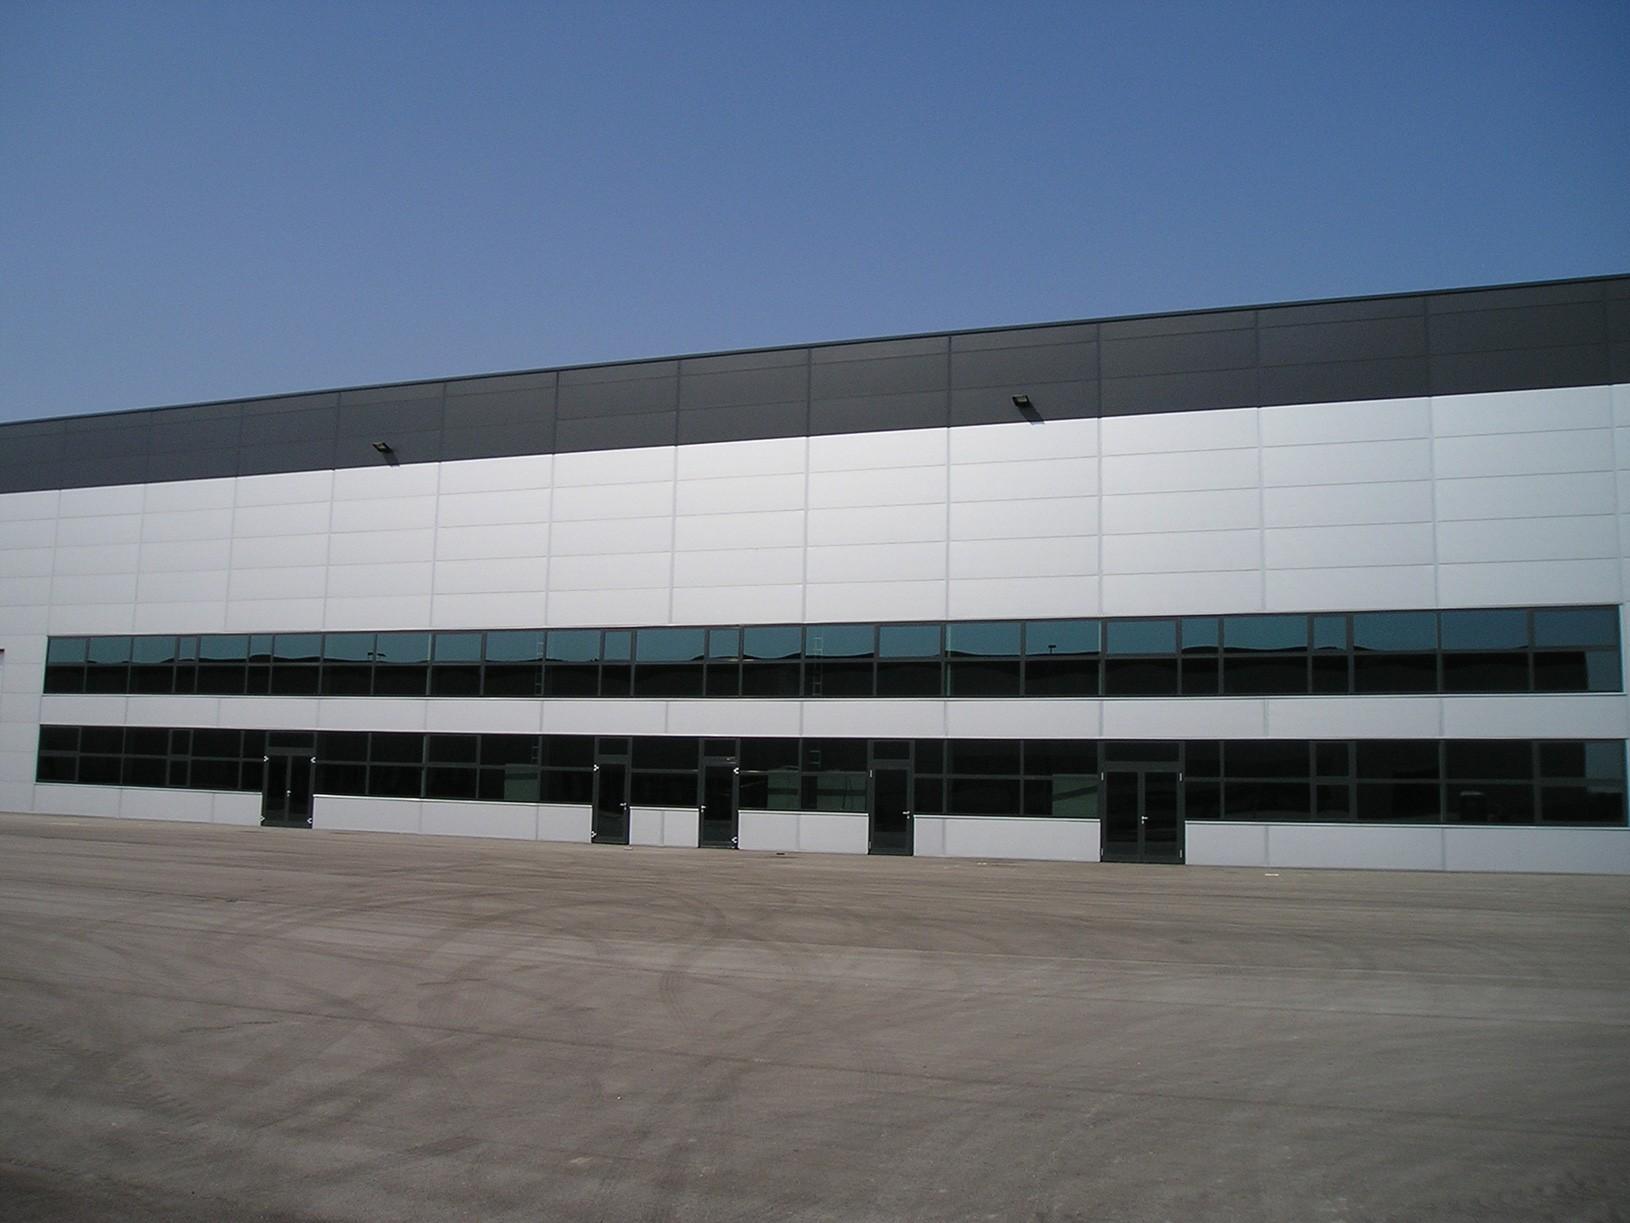 POSLOVNI PARK ZAGREB poslovni prostori, skladišne hale, upi-2m